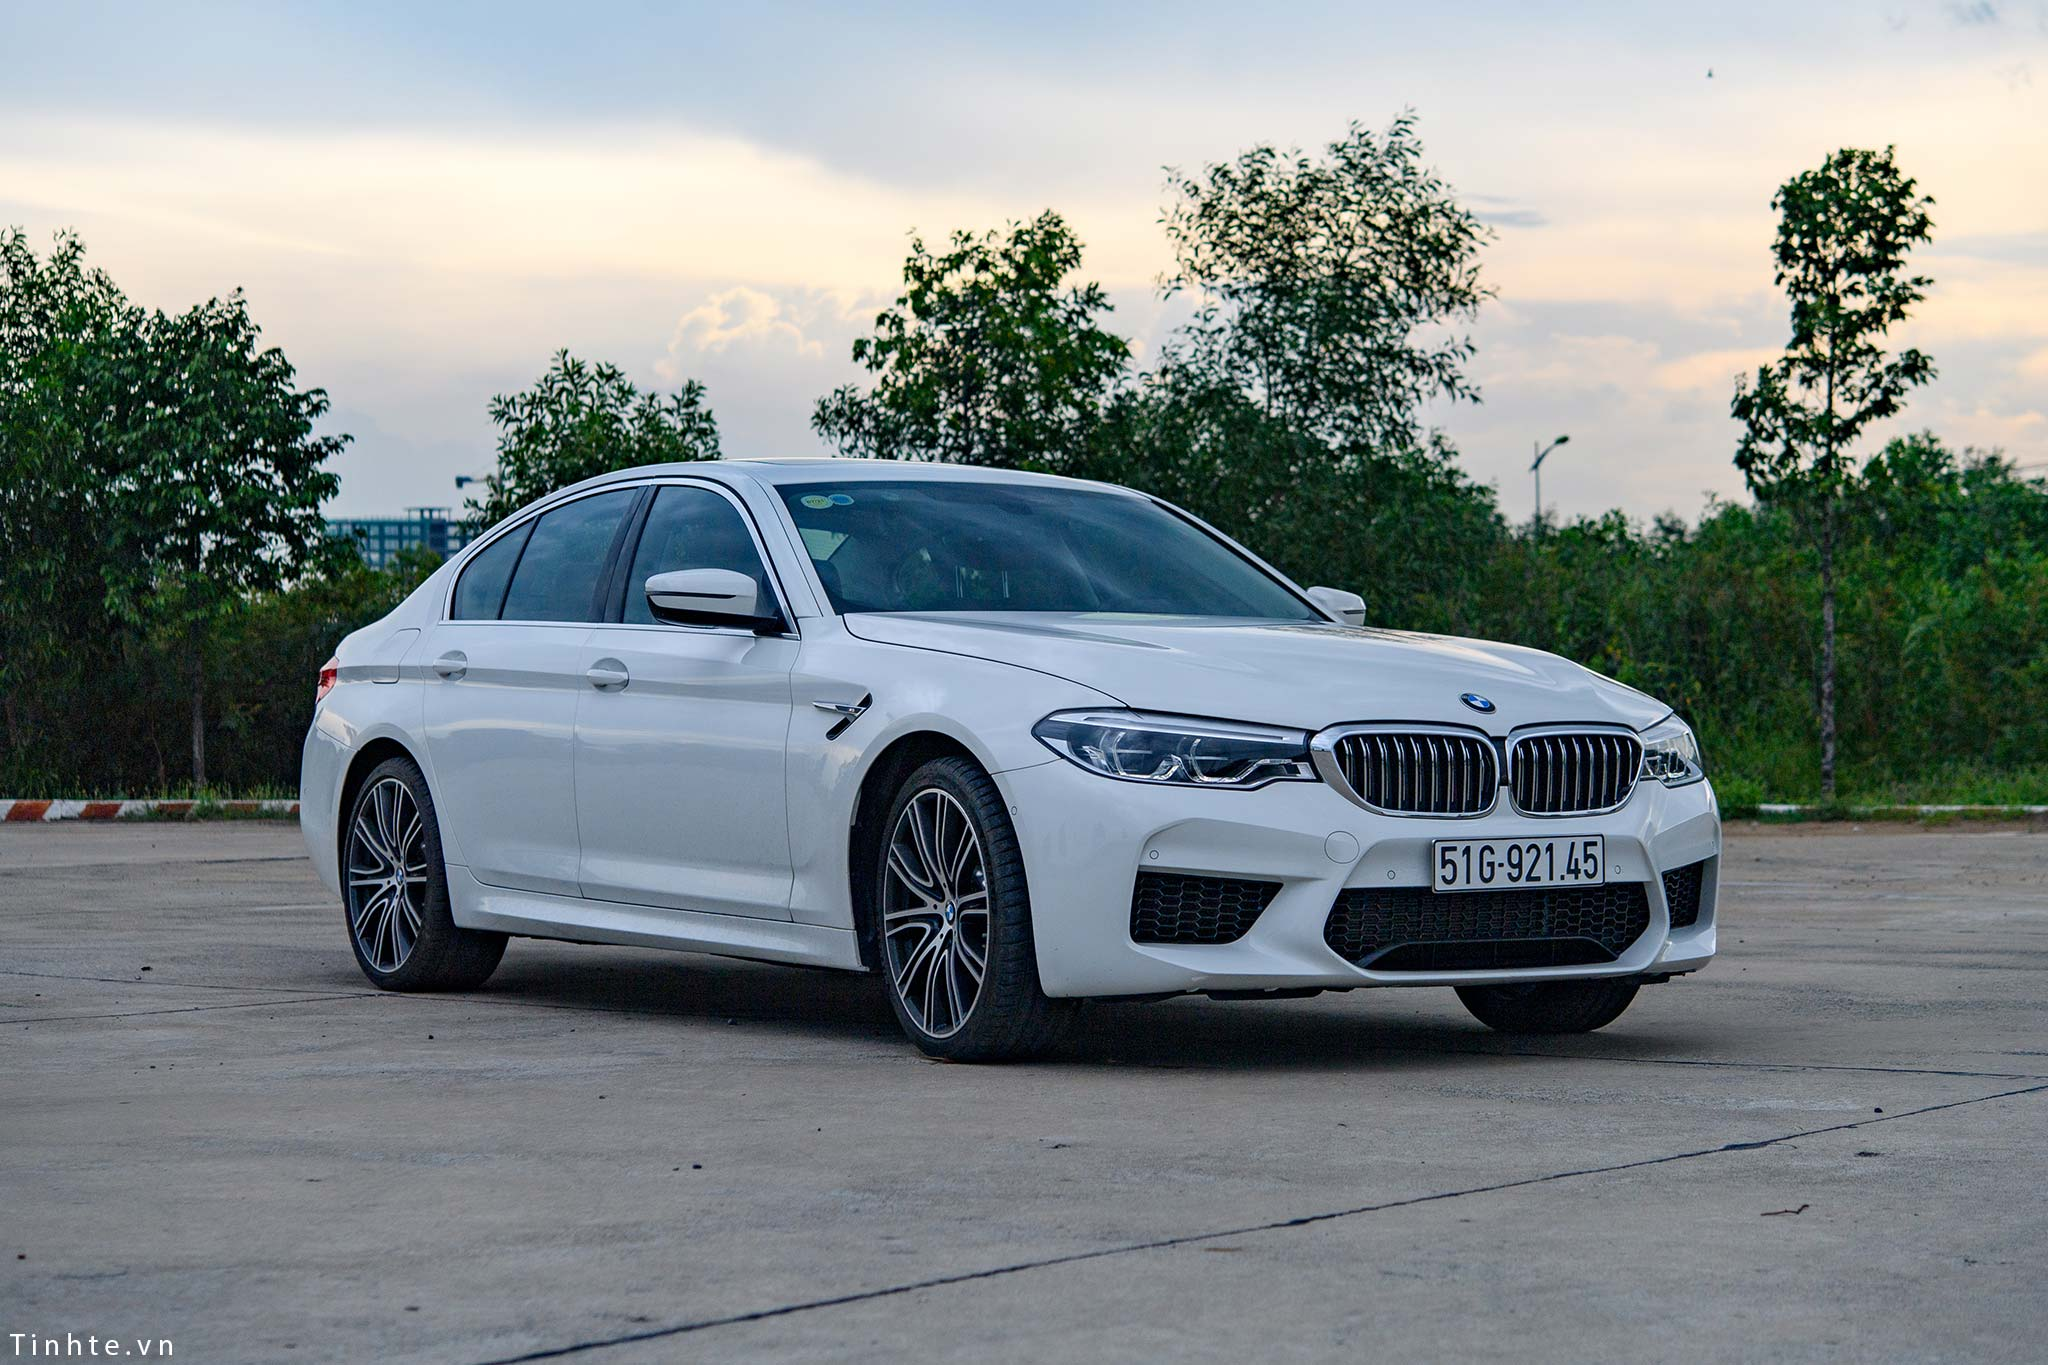 BMW_530i_G30_tinhte_36.jpg